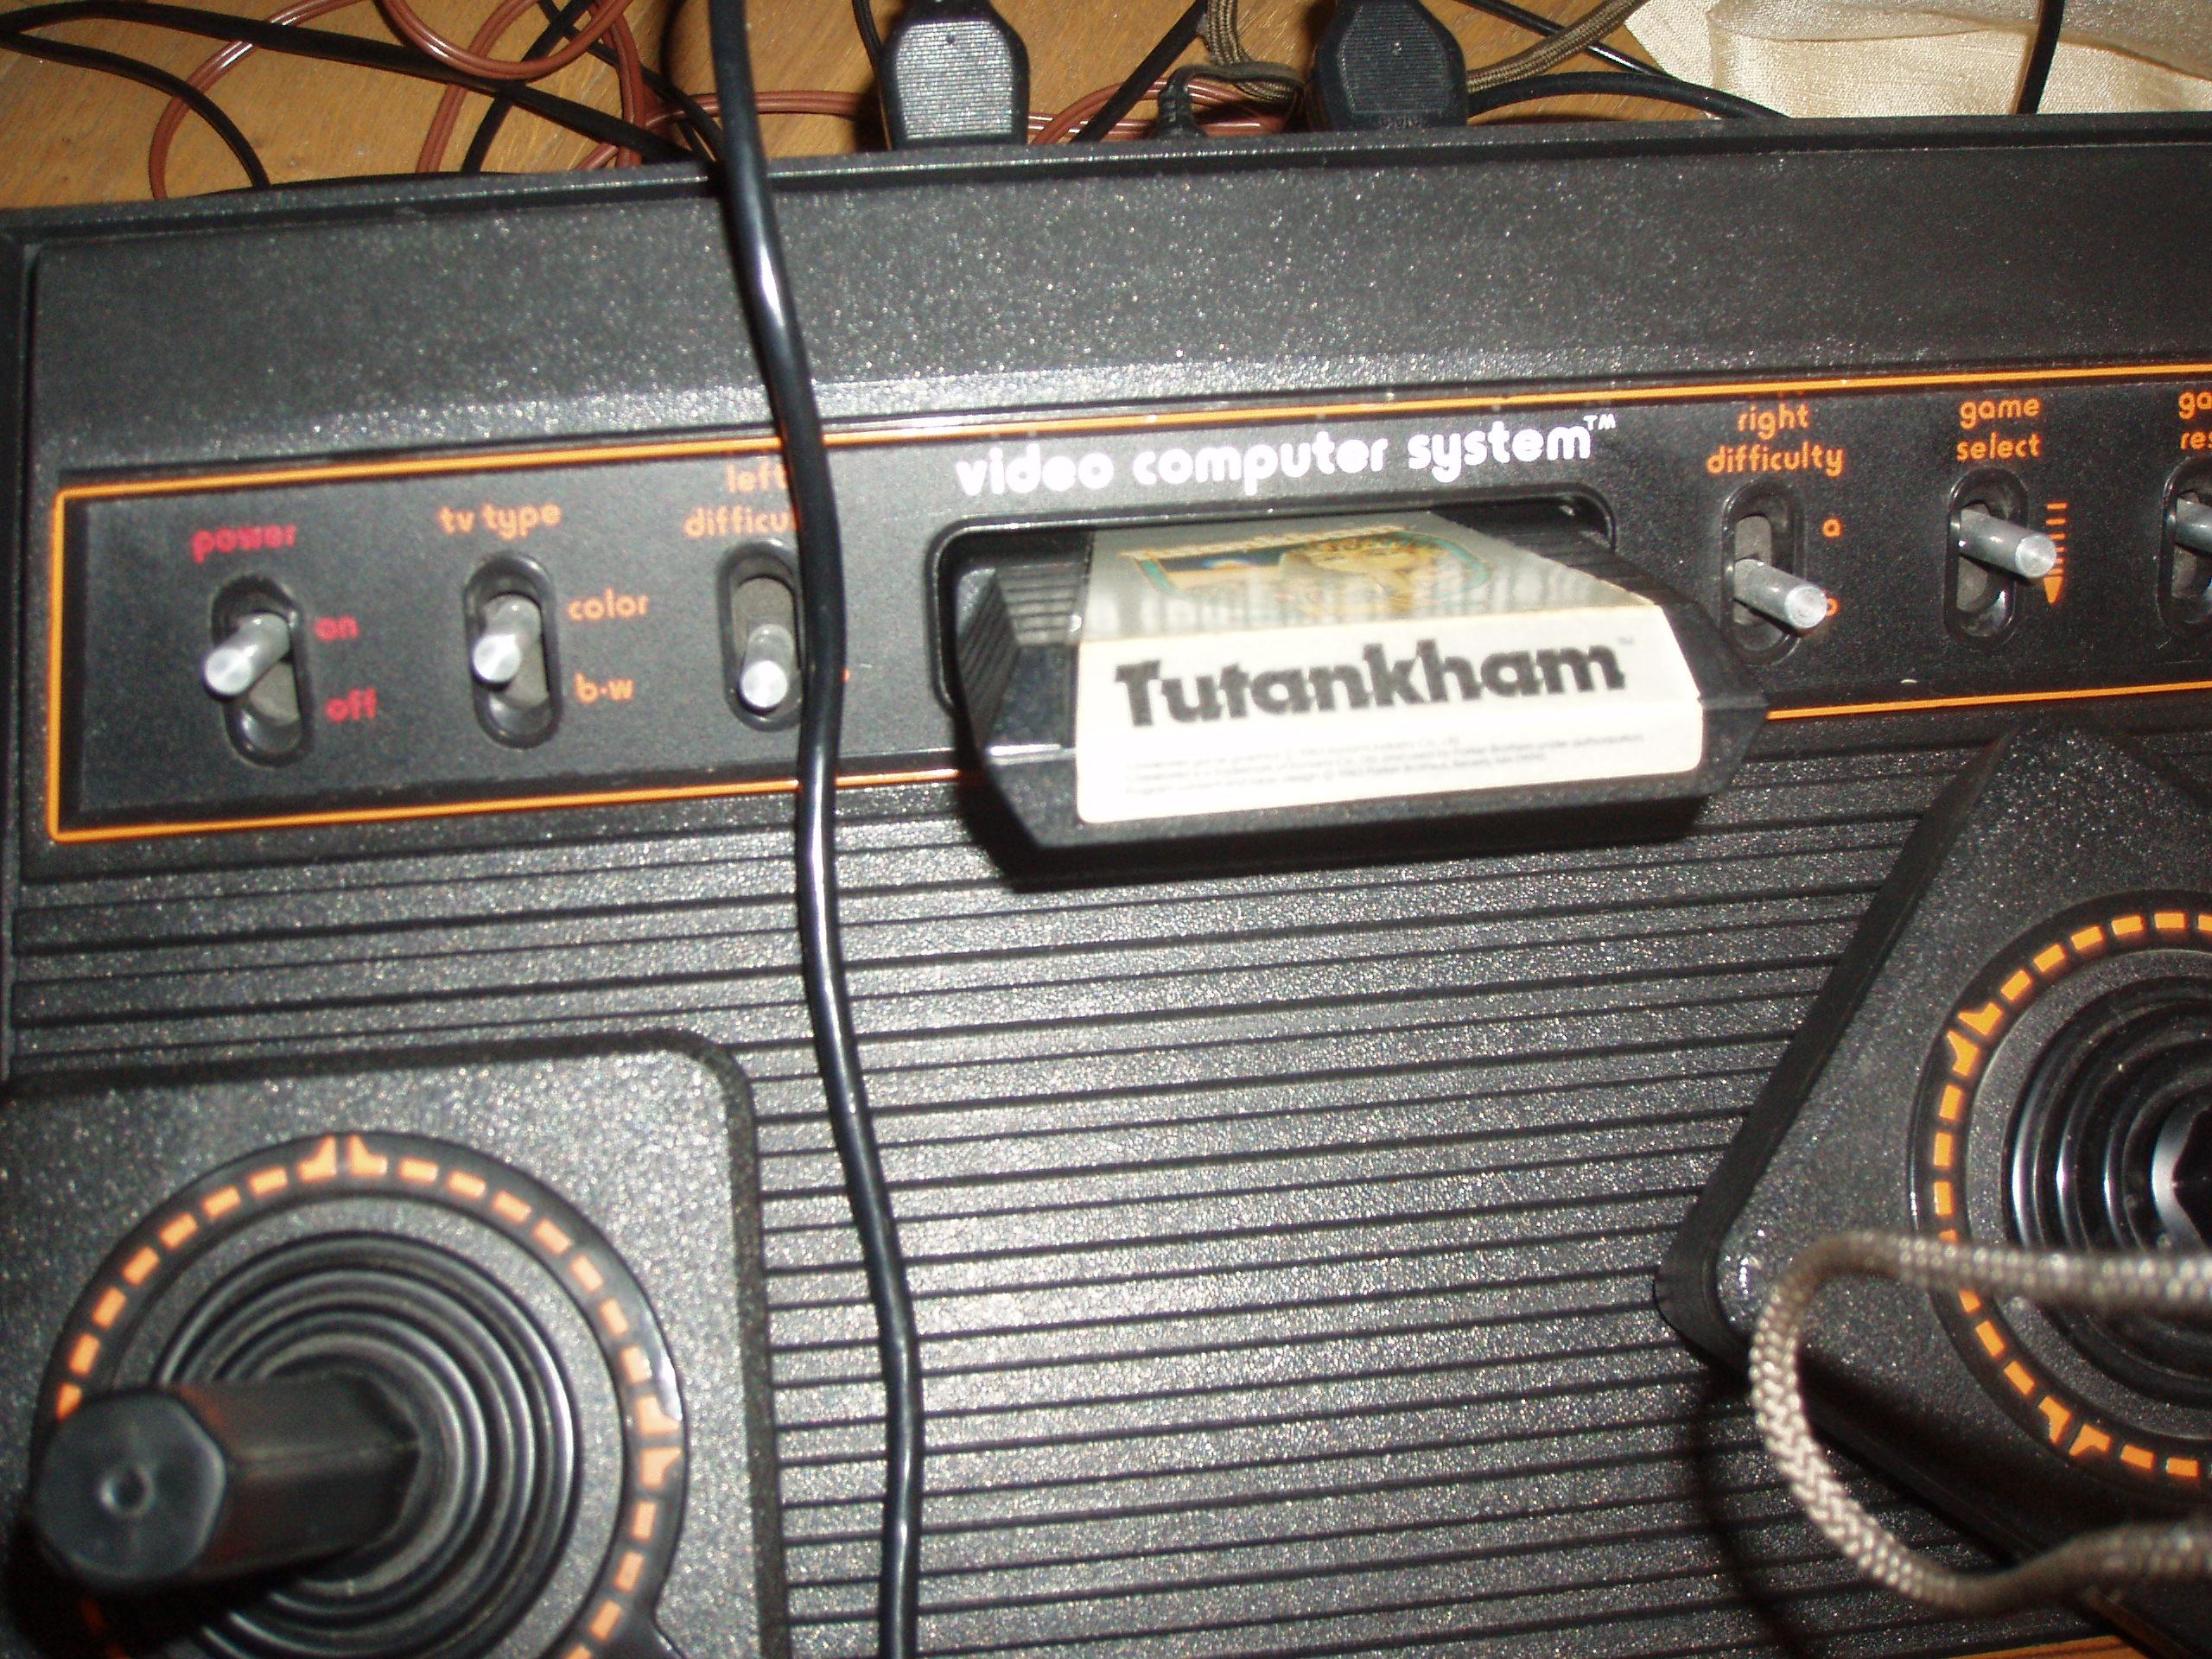 atari2600forever: Tutankham (Atari 2600) 425 points on 2017-09-01 03:59:46